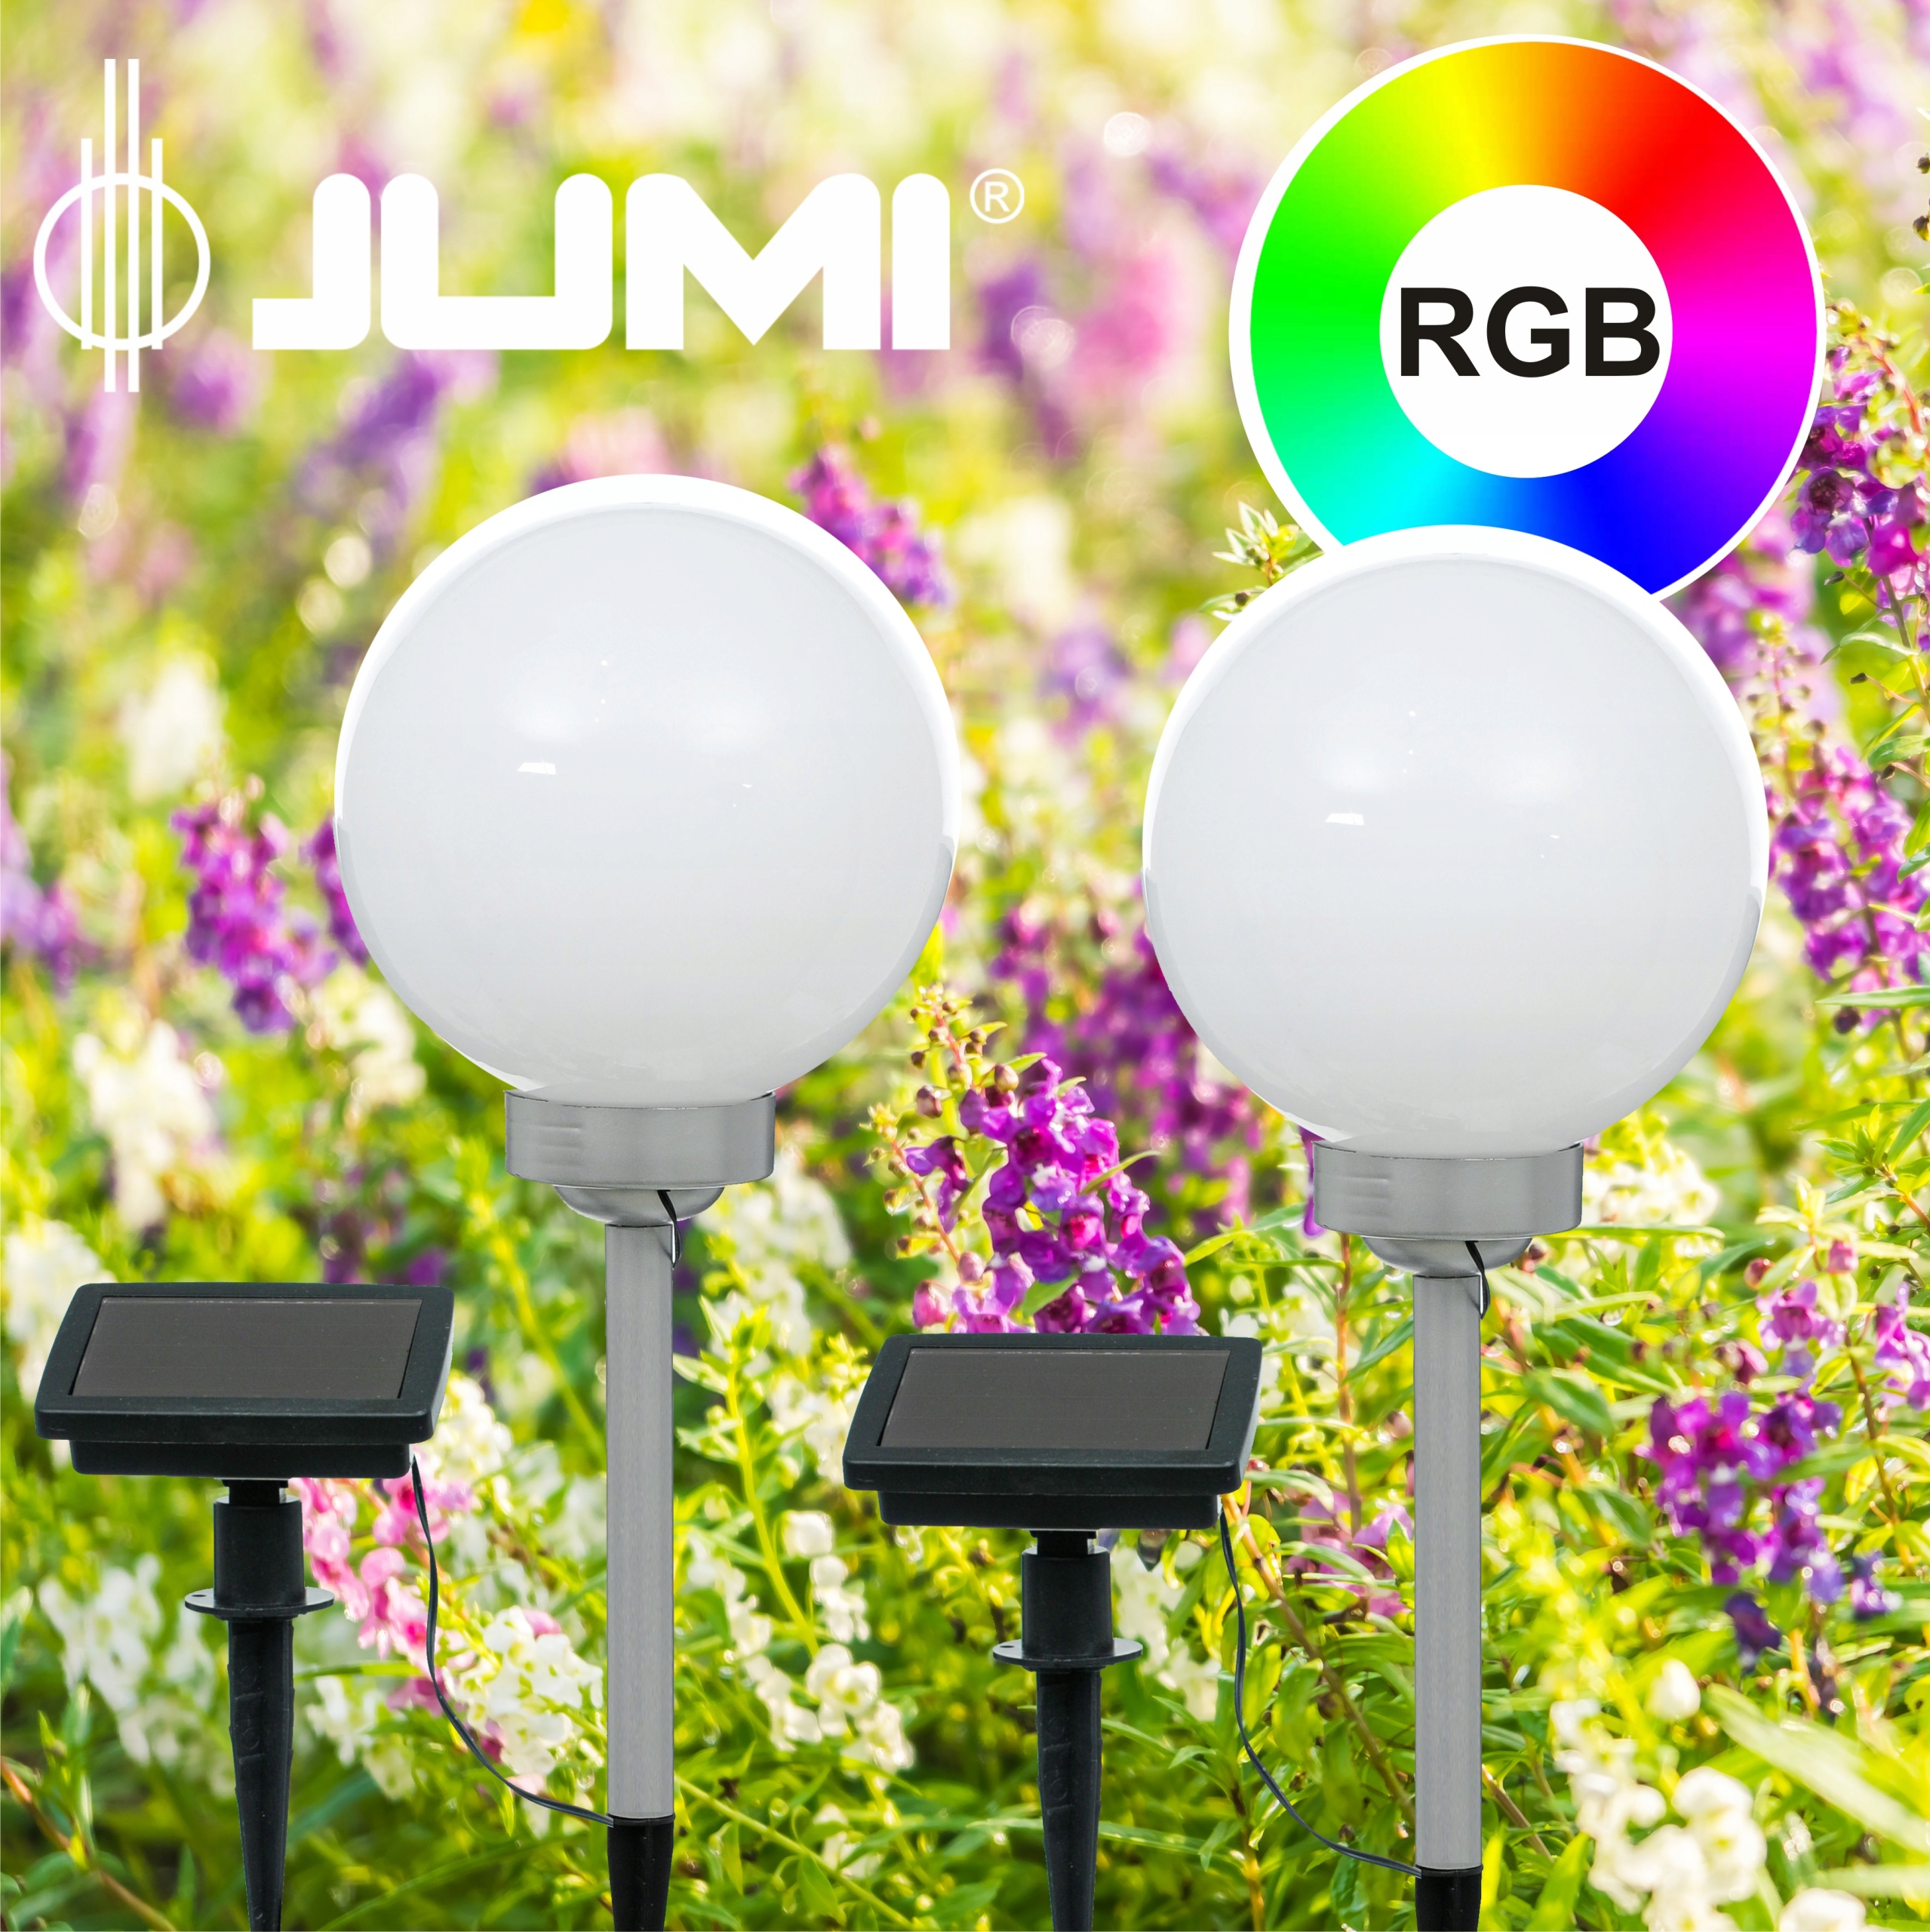 2 Szt Lampa Solarna Kula Rgb Lampy Solarne Komplet